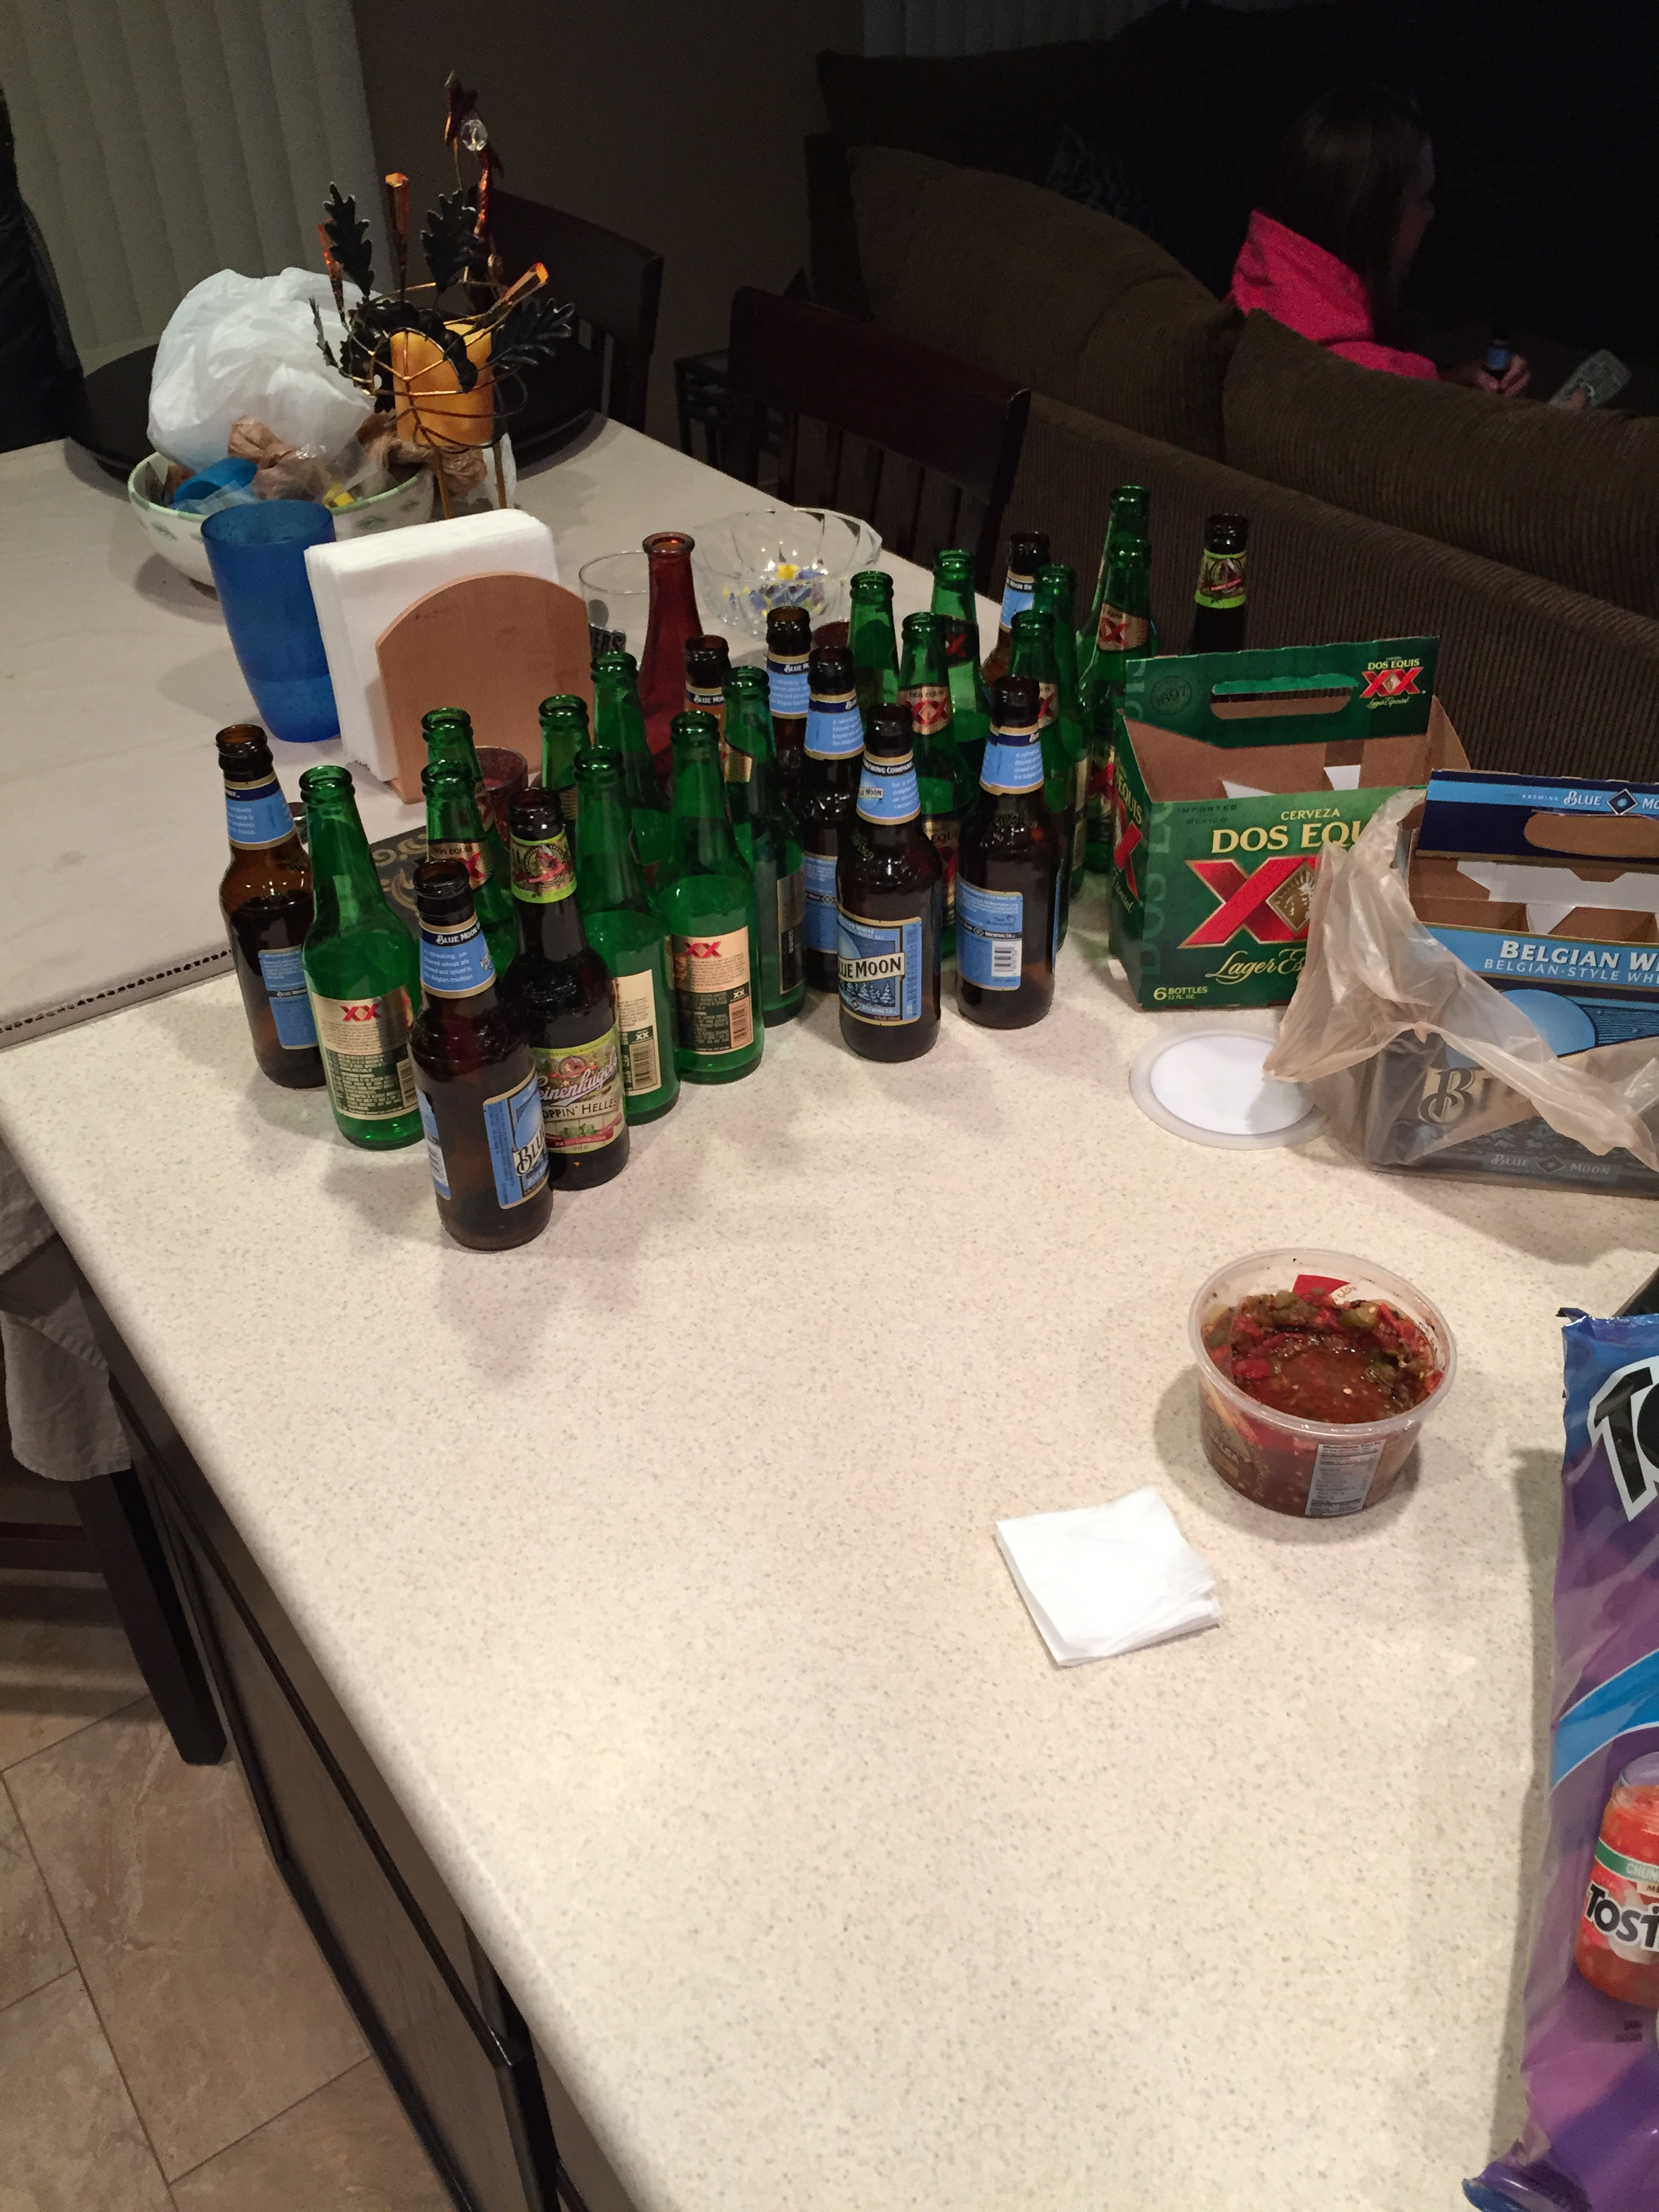 Poker night...we believe in recycling haha